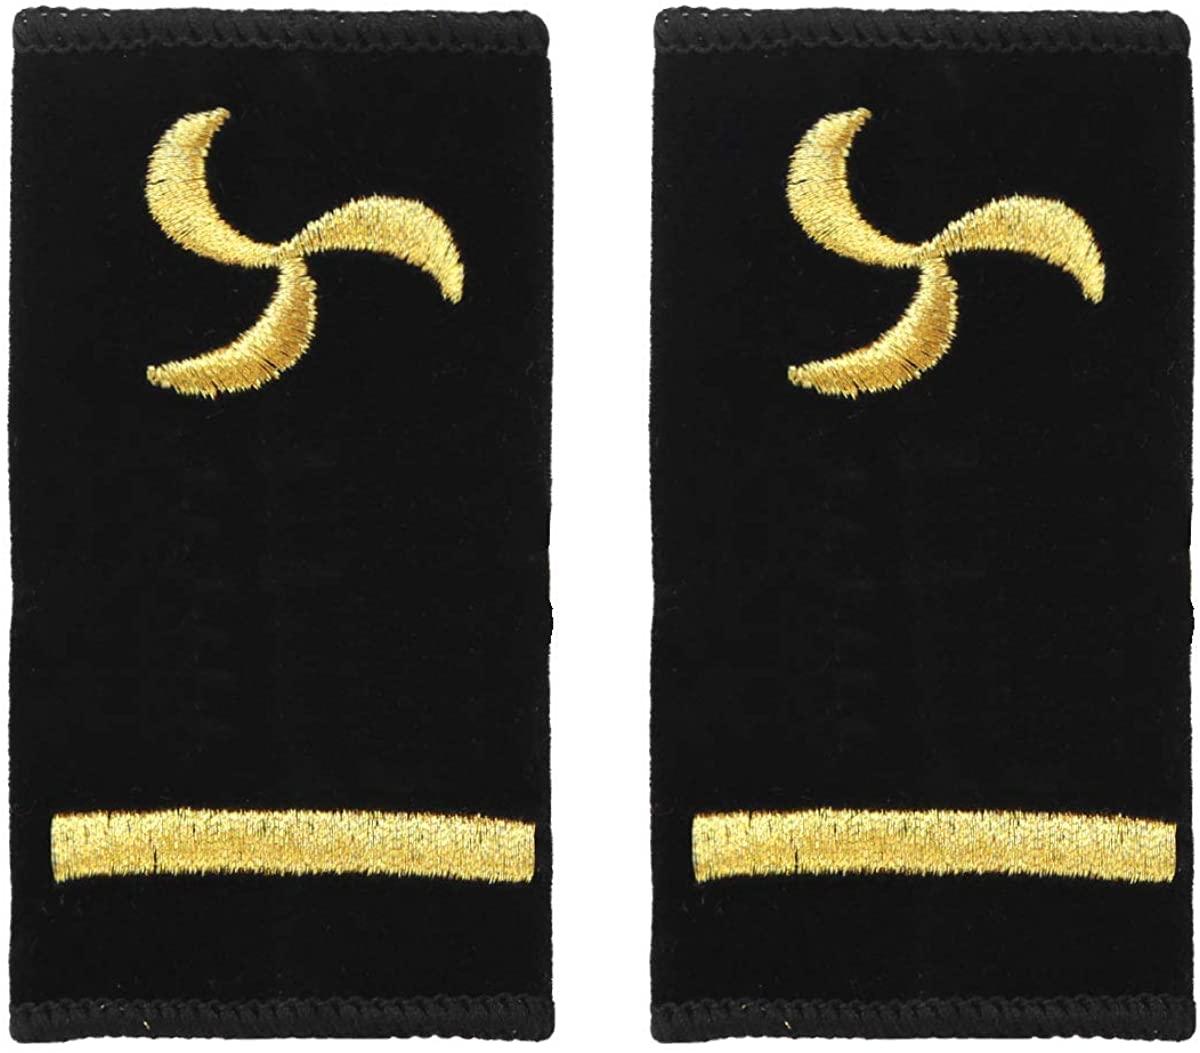 CHICTRY Captain Epaulets Sailor Uniform Epaulettes Shoulder Boards with Gold Embroidered Propeller for Mariner Seaman